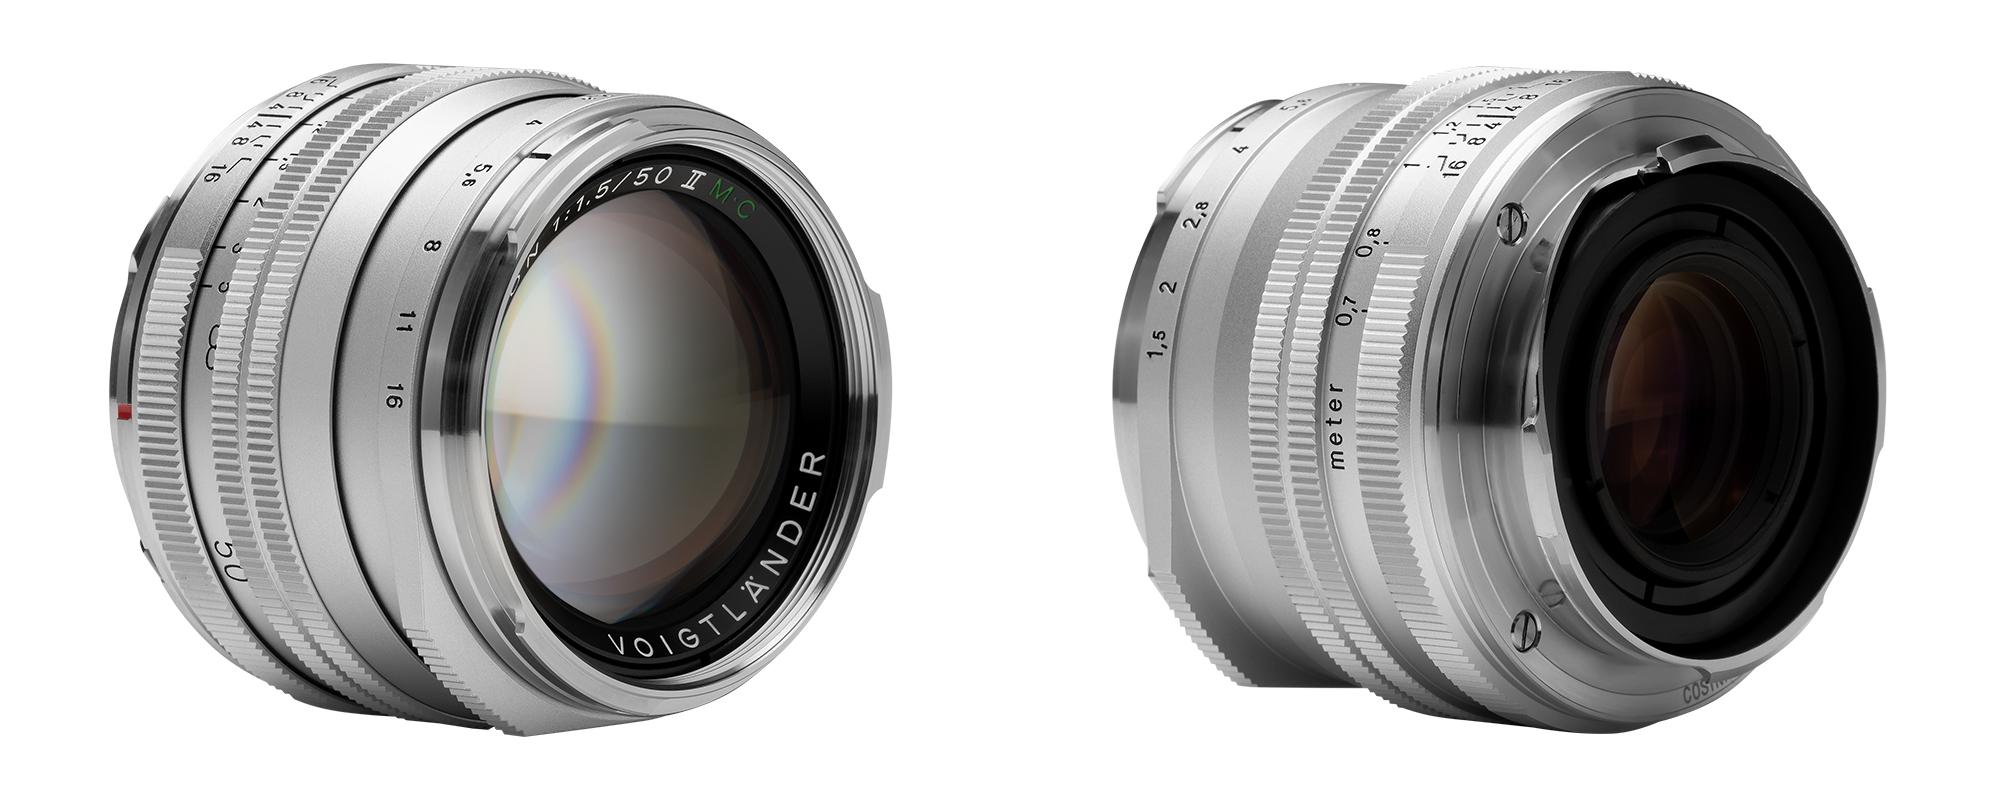 Voigtlander Nokton II 50 mm f/1.5 lens for Leica M - front and back